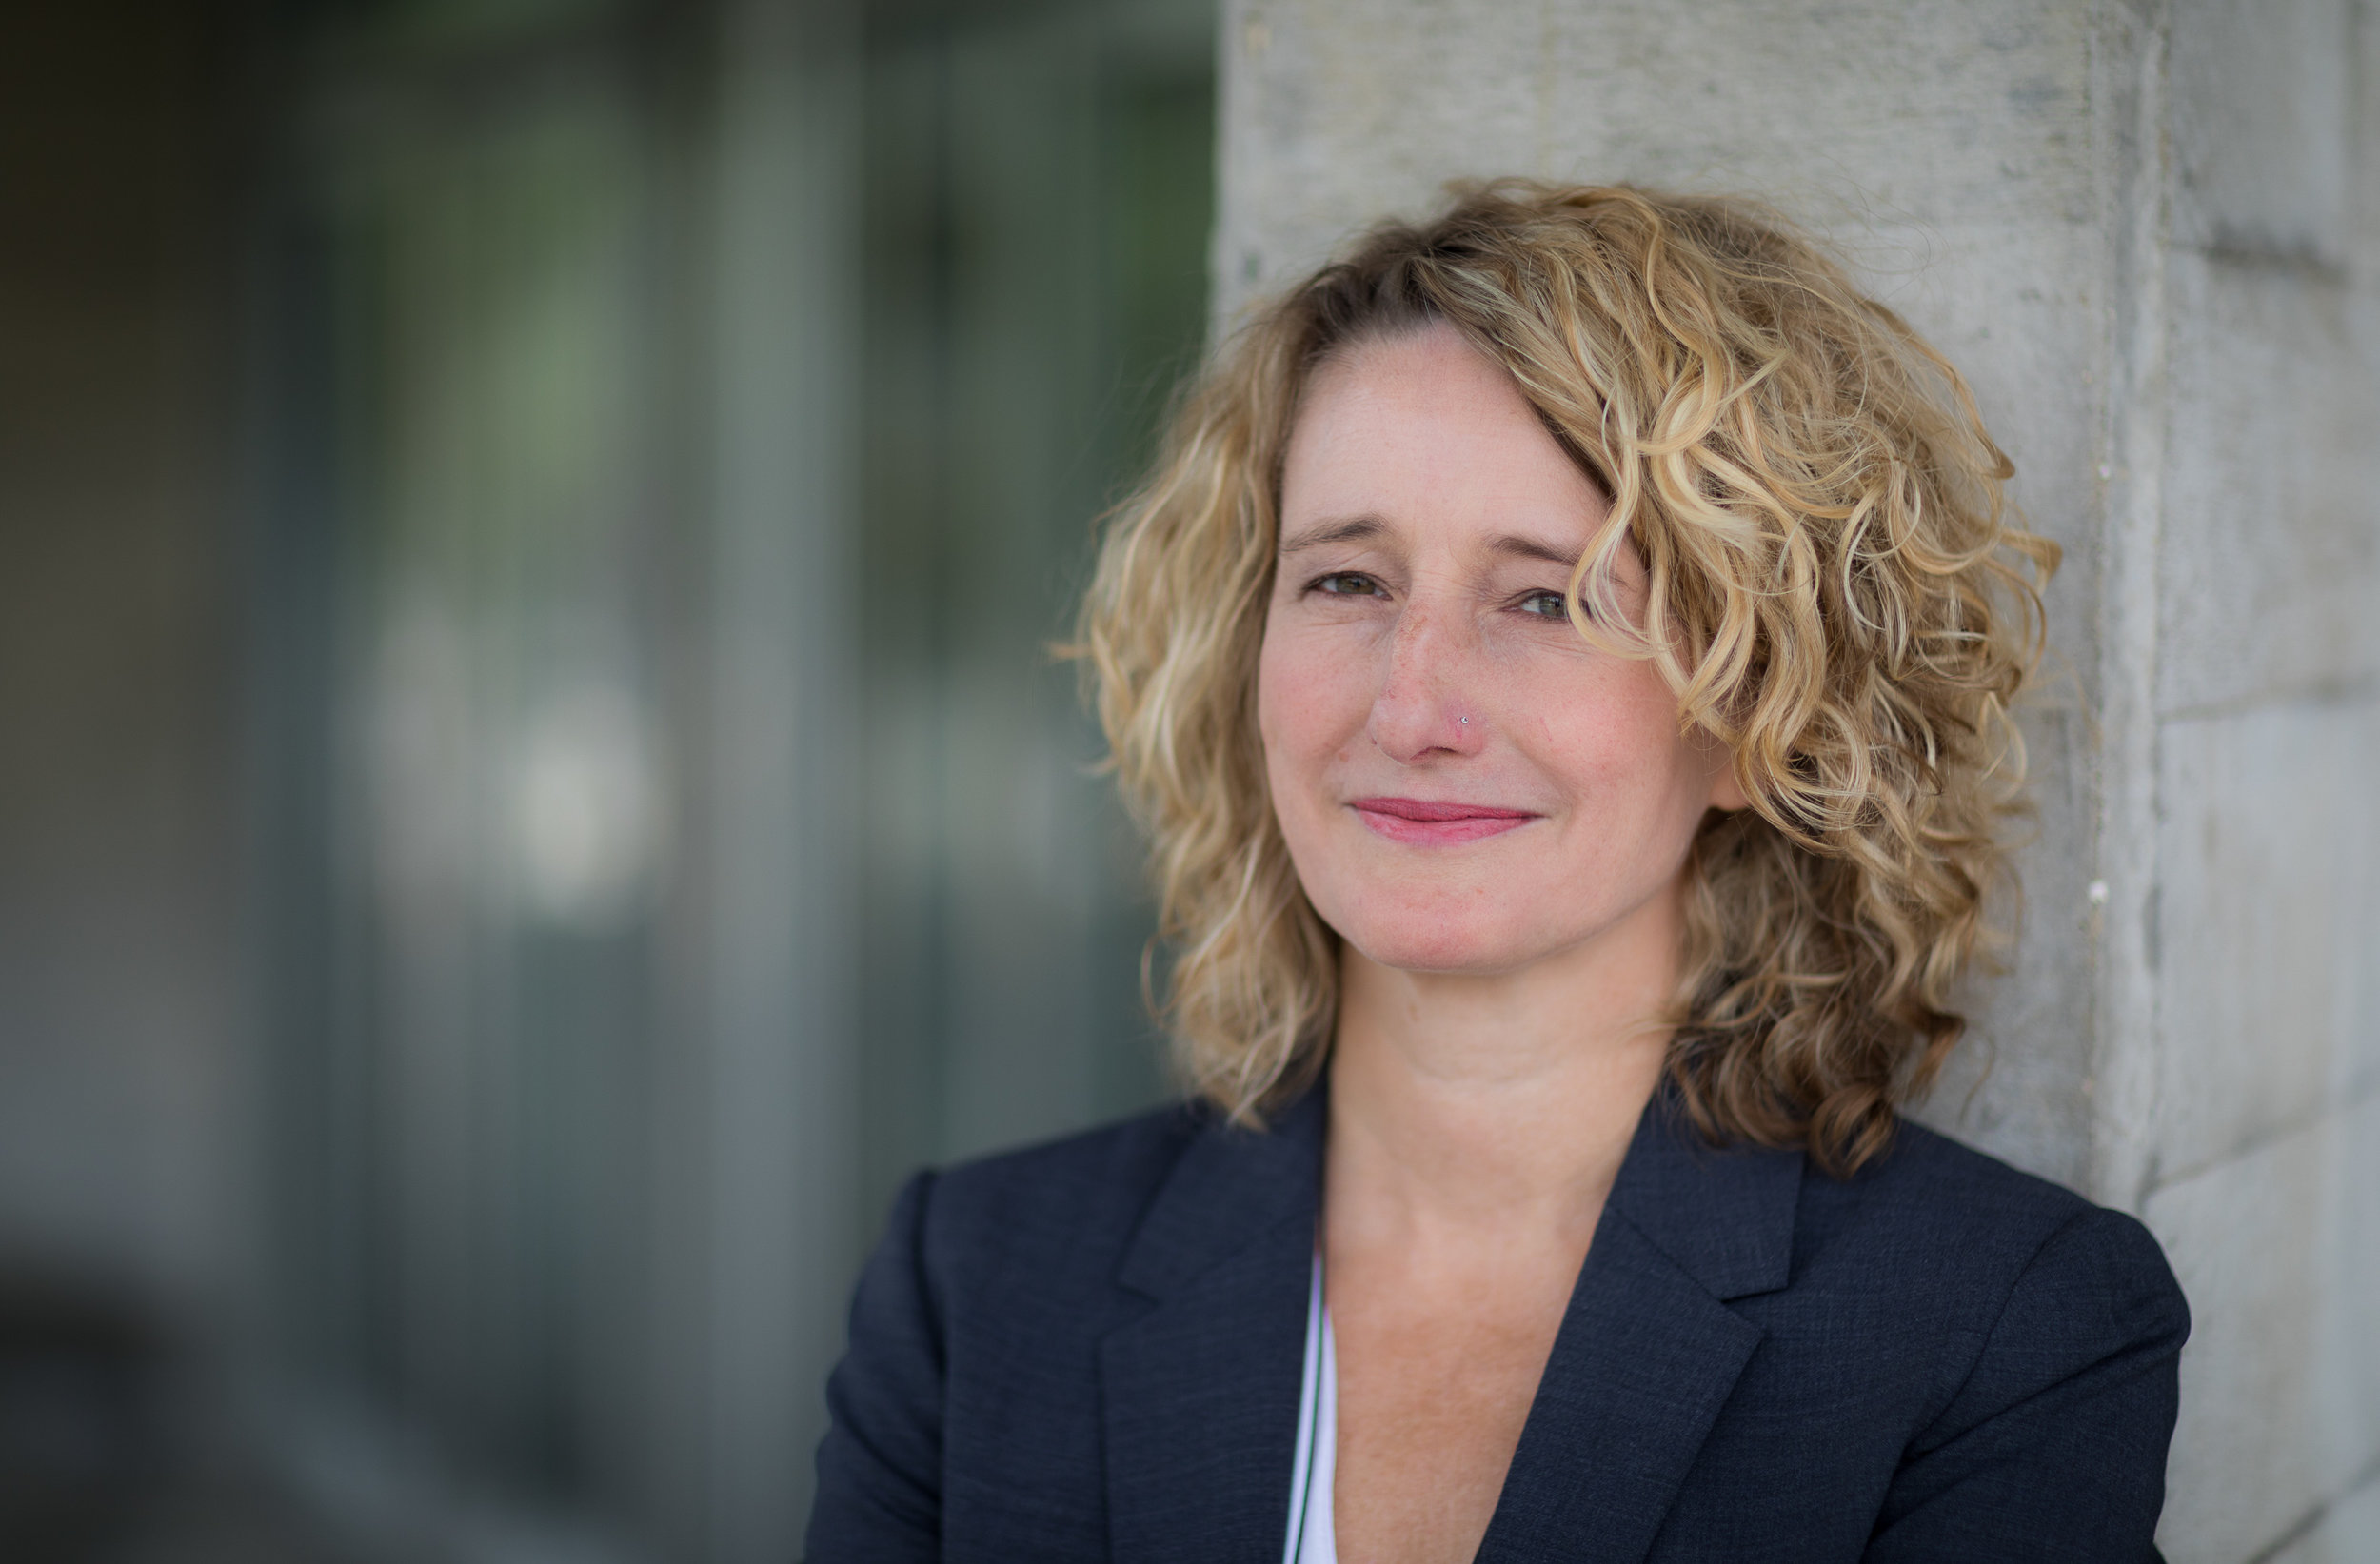 Tricia Tuttle, Artistic Director of the 2018 BFI London Film Festival